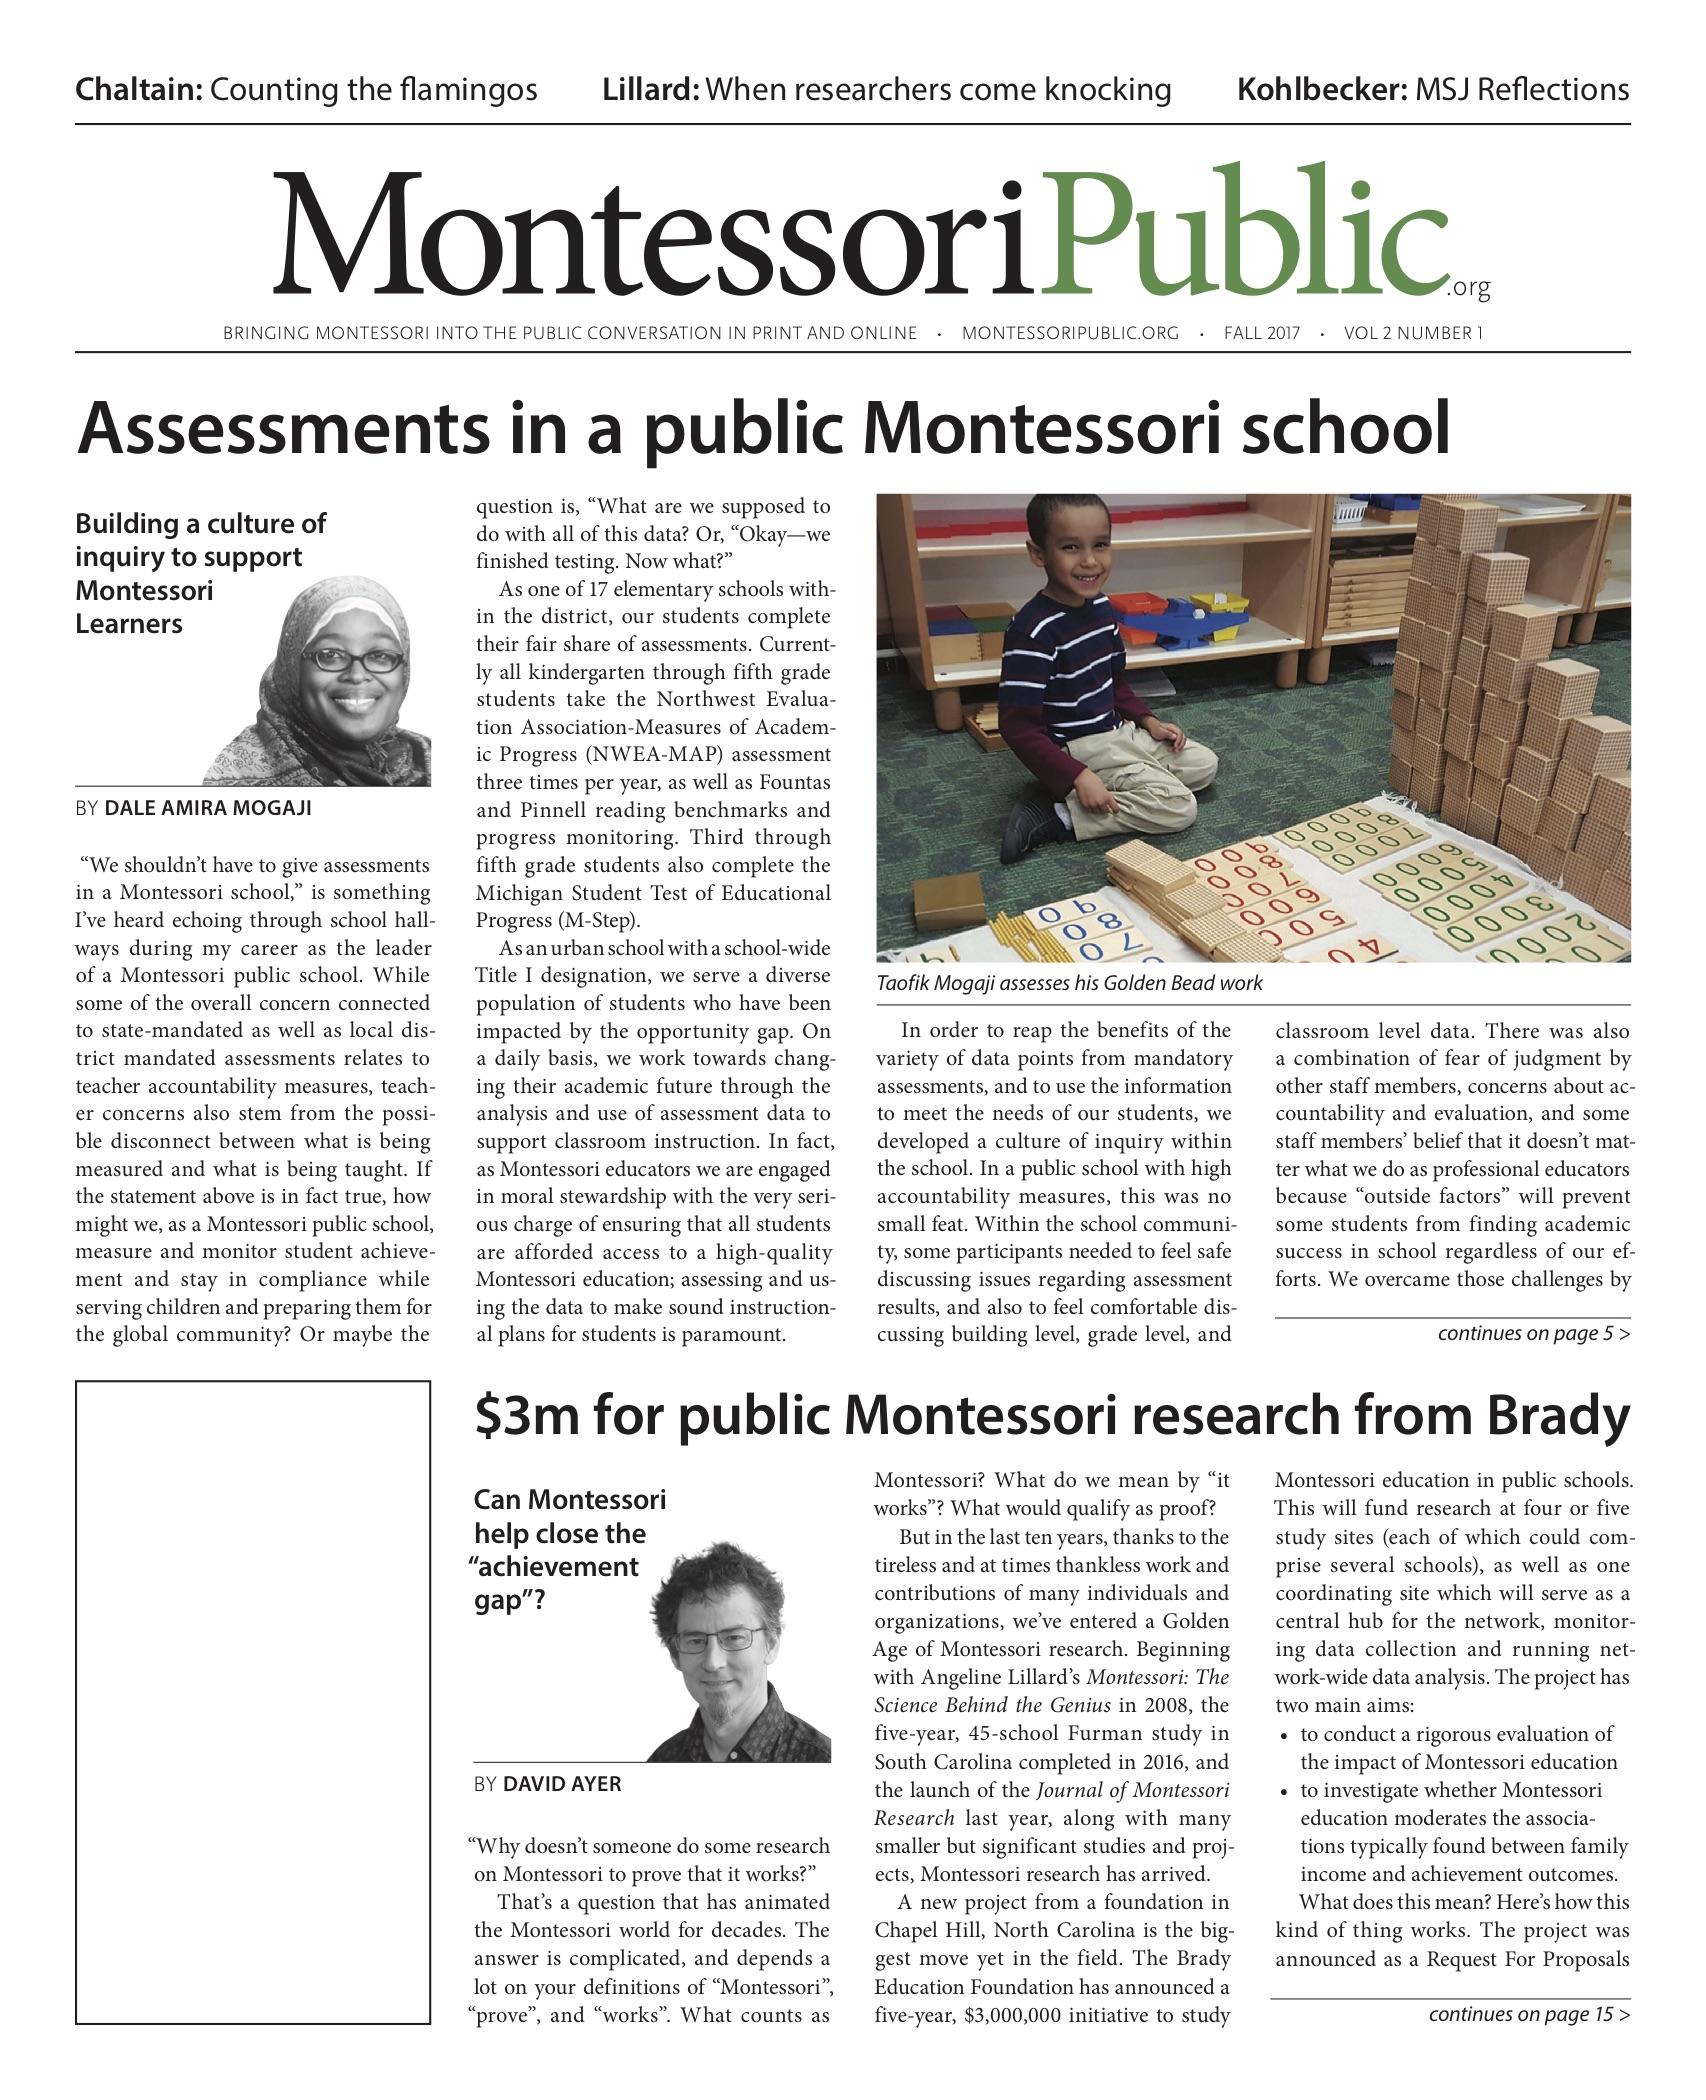 MontessoriPublic—Print Edition Volume 2 #1